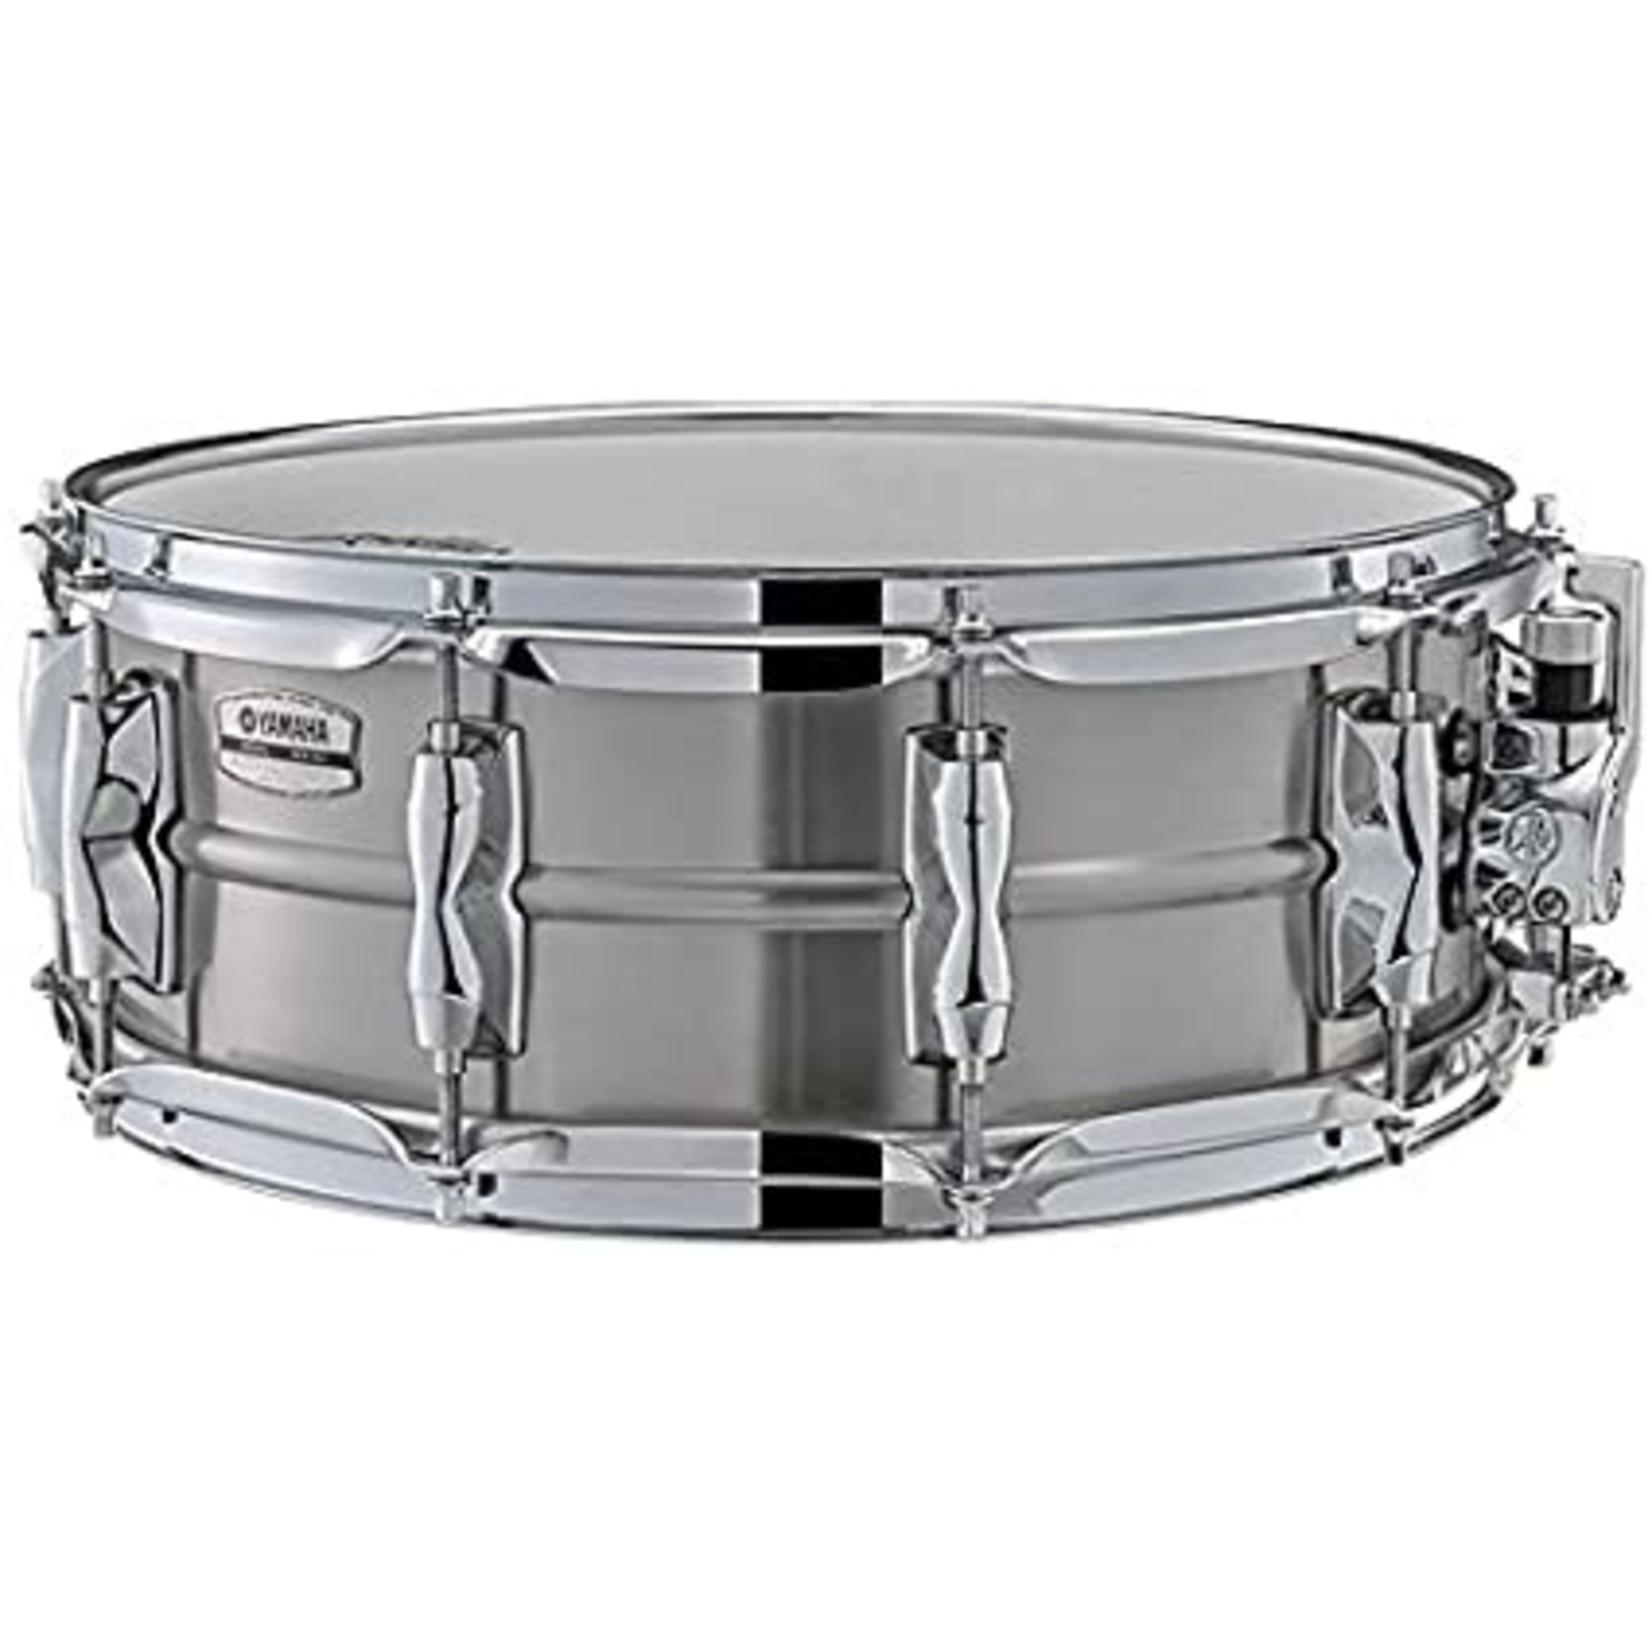 "Yamaha Yamaha 5.5x14 Recording Custom Snare Drum ""Stainless Steel"""